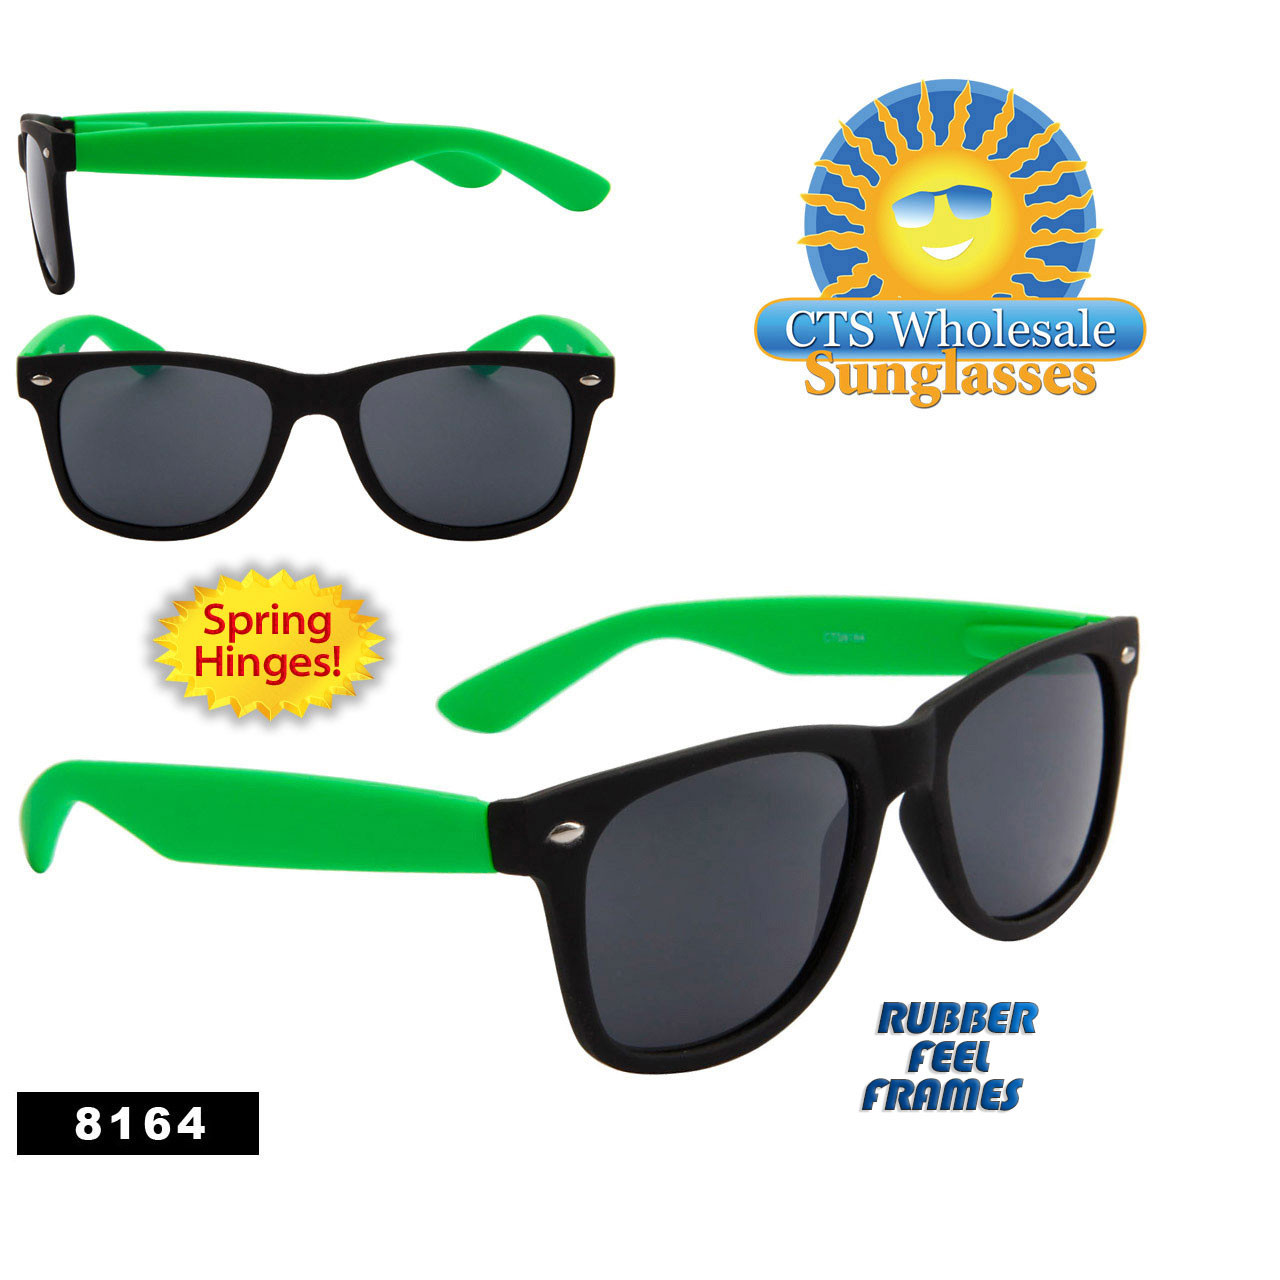 Black & Green California Classics Sunglasses Wholesale - Style #8164